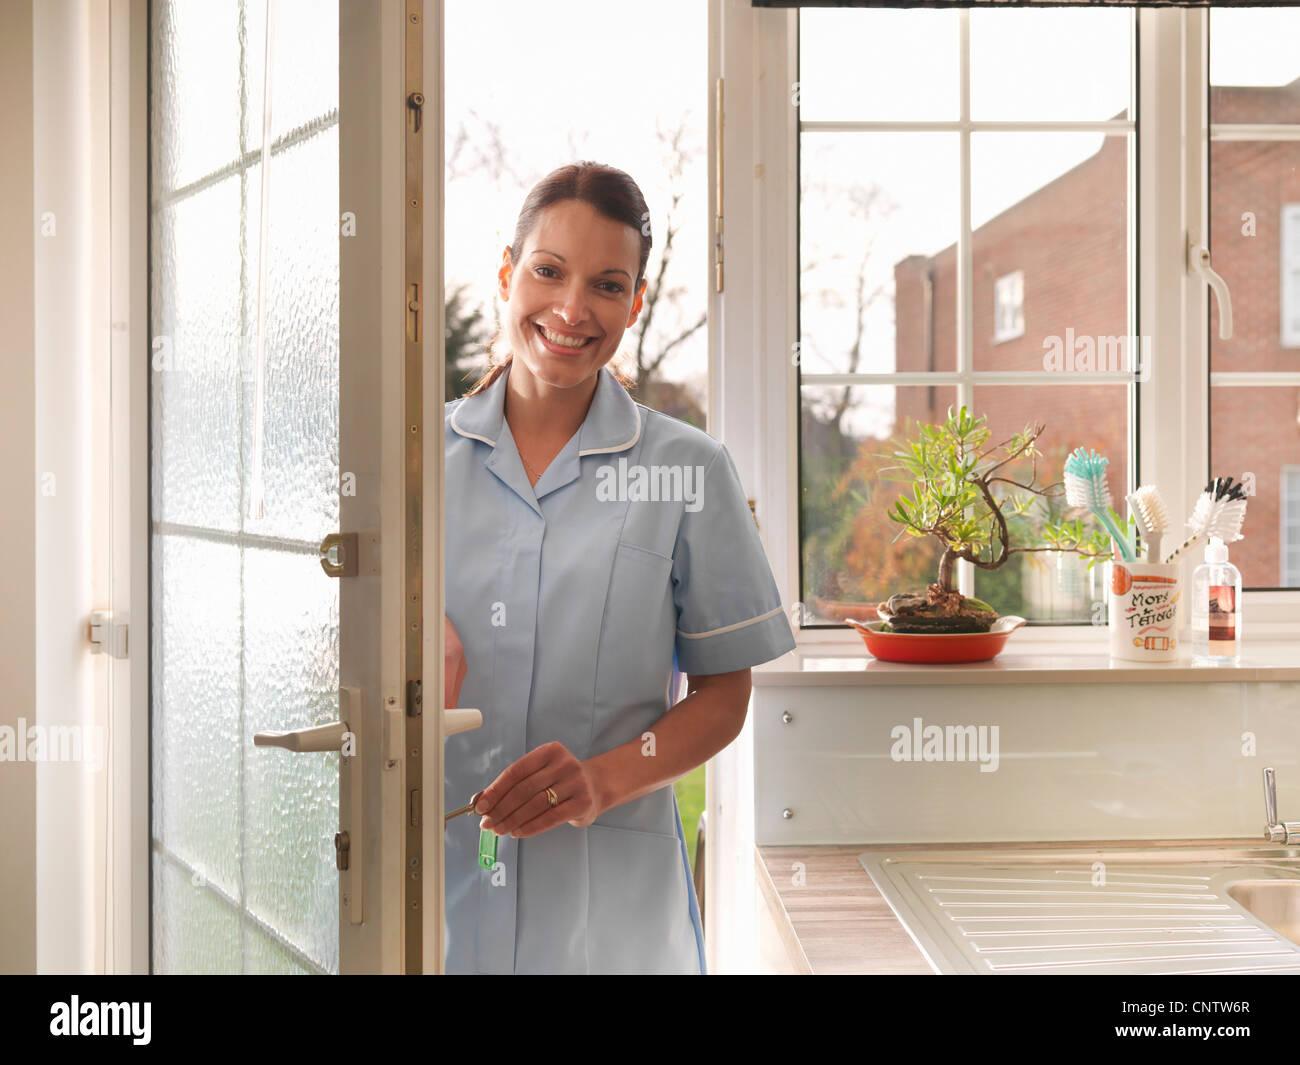 Woman Unlocking The Door Stock Photos Amp Woman Unlocking